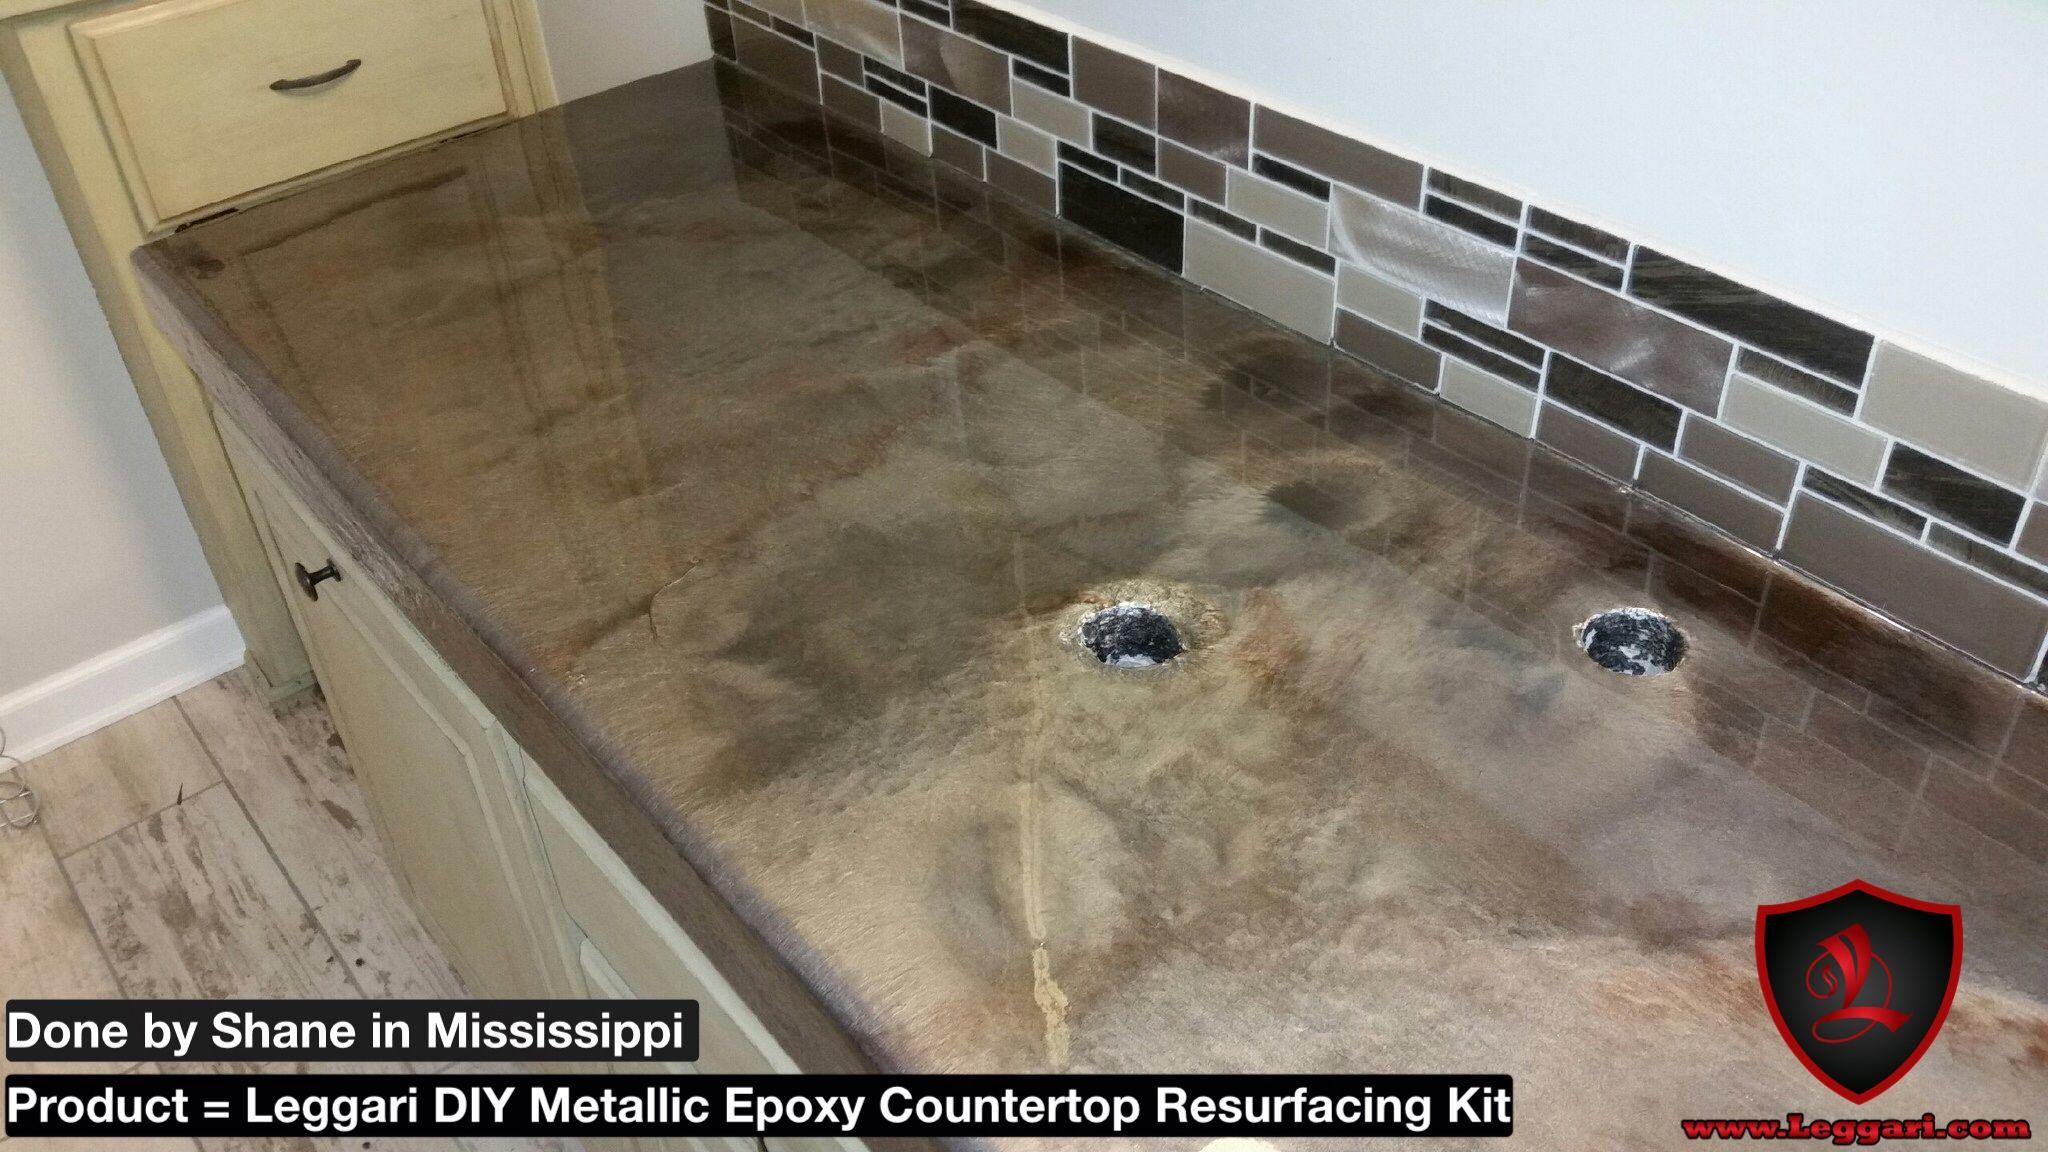 Diy Epoxy Countertop Resurfacing Kits Order Yours Today And